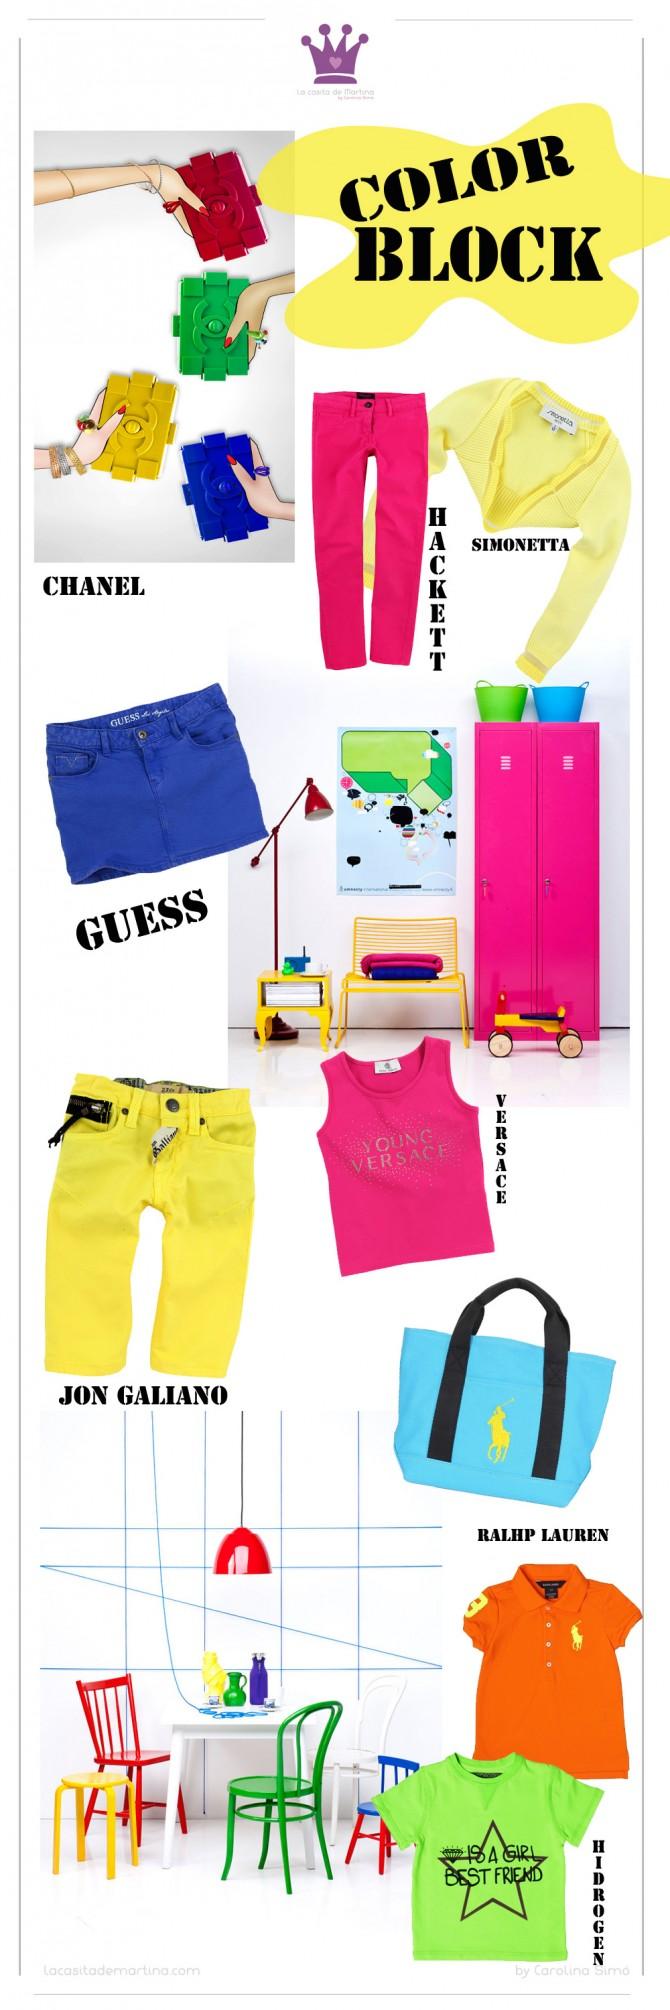 Color Block, Tendencias Moda Infantil, Blog de moda infantil, La casita de Martina, Chanel